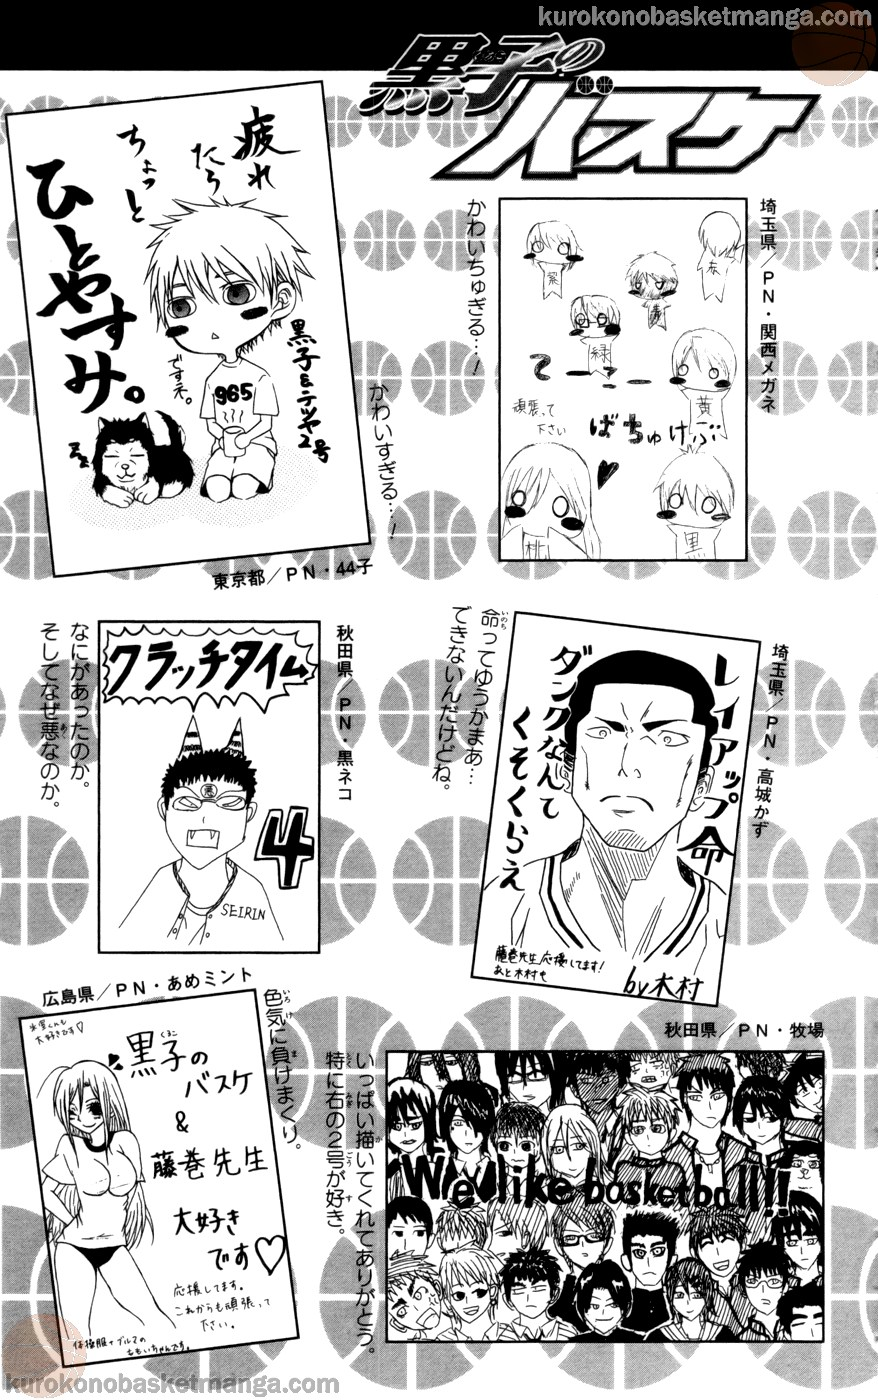 Kuroko no Basket Manga Chapter 108 - Image 26